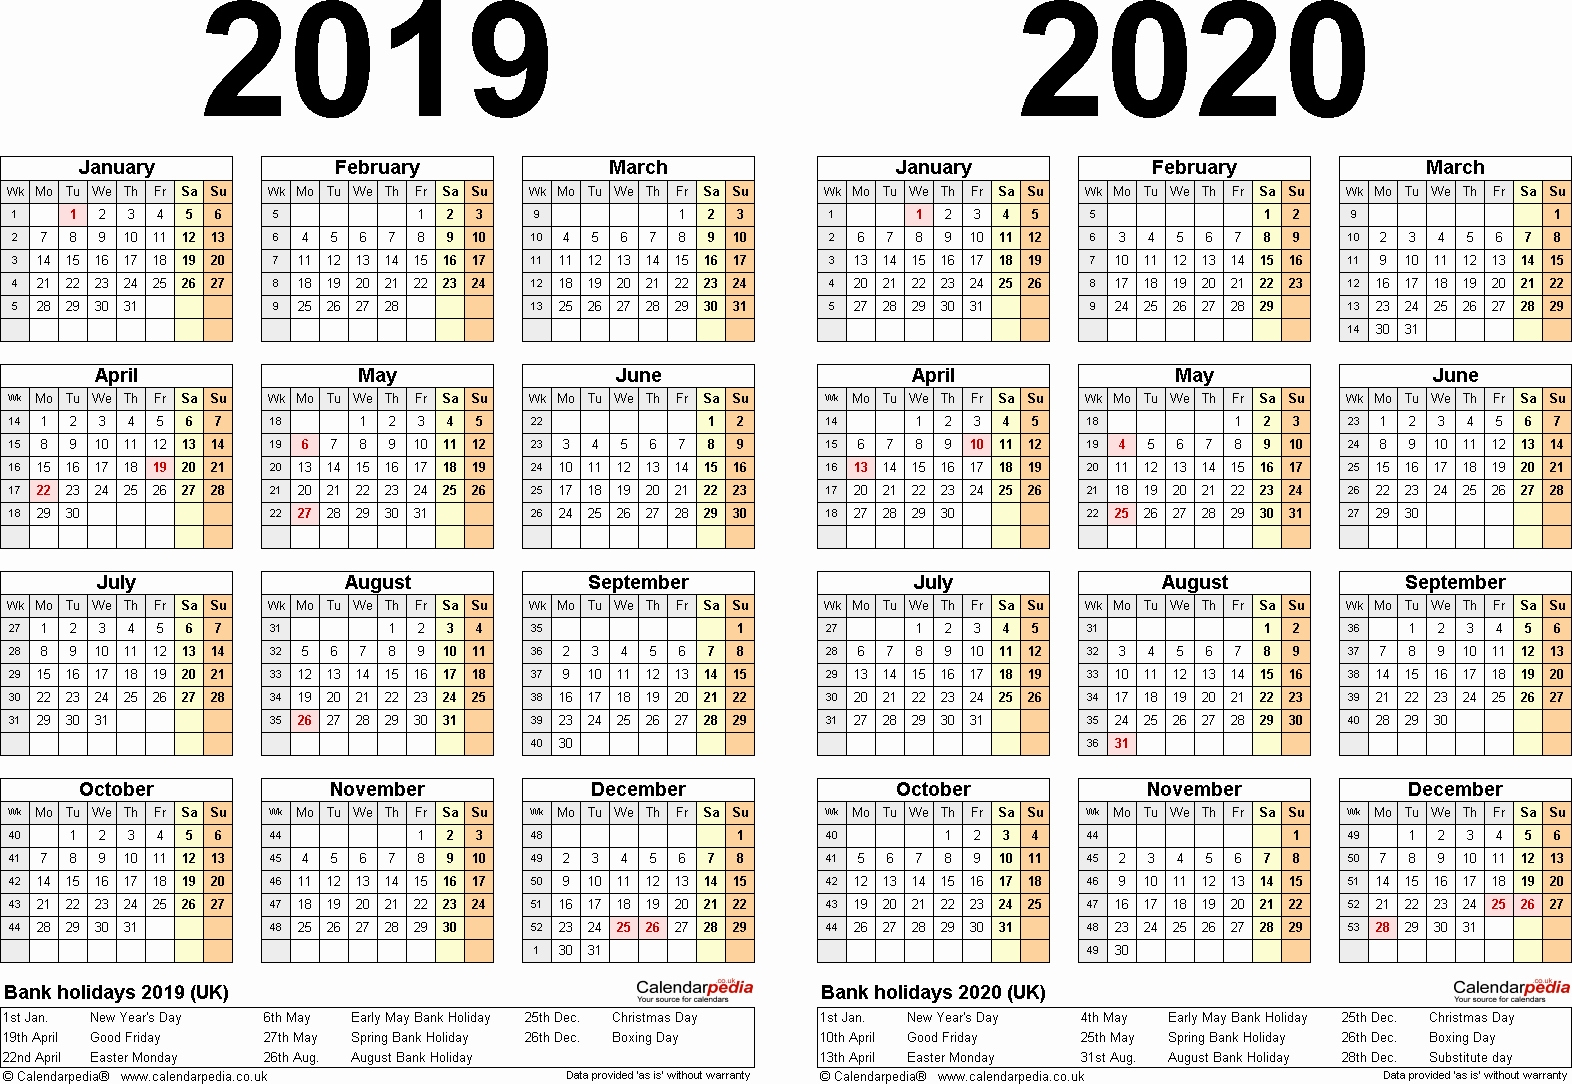 A4 Yearly Calendars For 2019 And 2020 - Calendar Multiple Year Printable Calendar